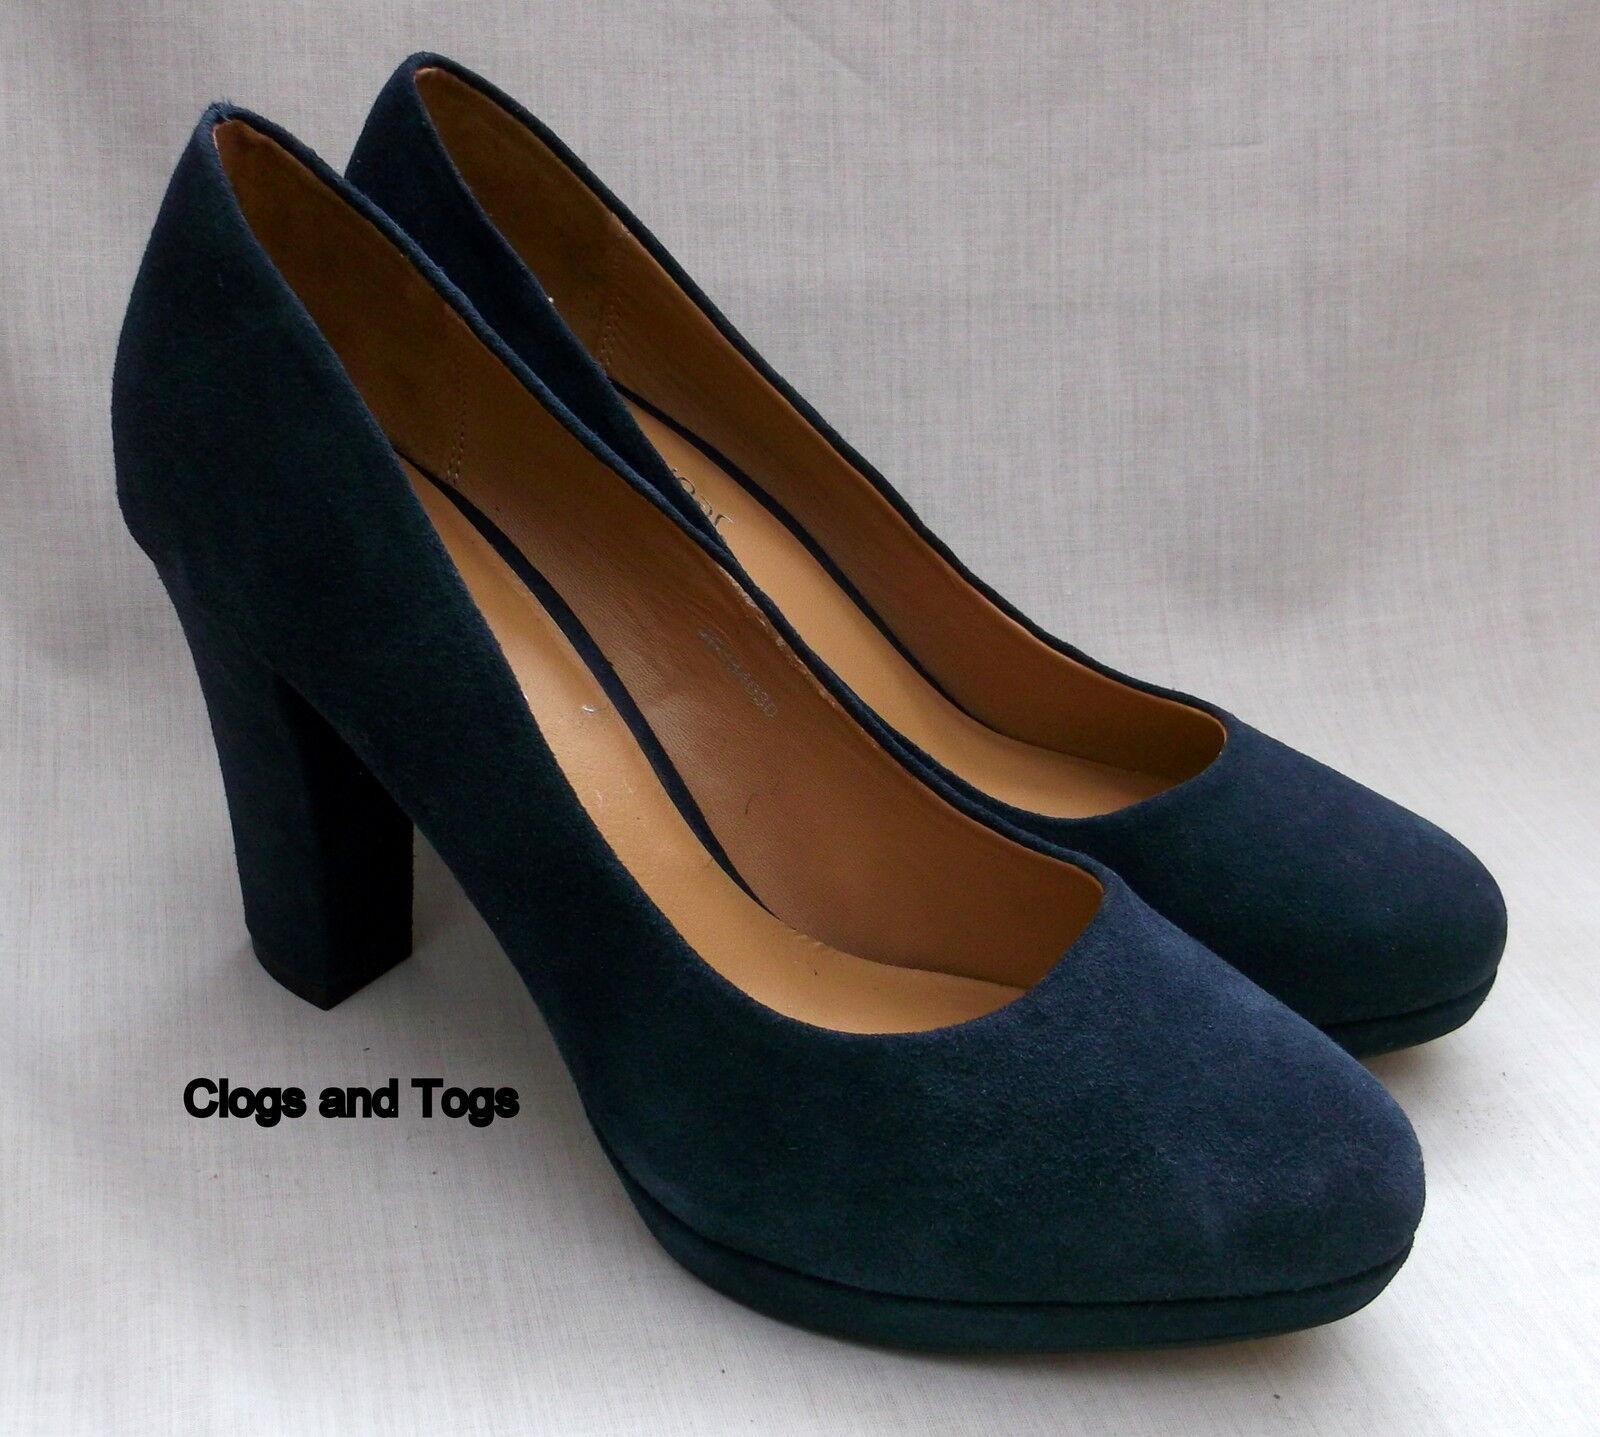 NEW CLARKS SOFTWEAR SOFTWEAR SOFTWEAR ANIKA ABBY WOMENS NAVY blueE SUEDE PLATFORM SHOES 2b955b